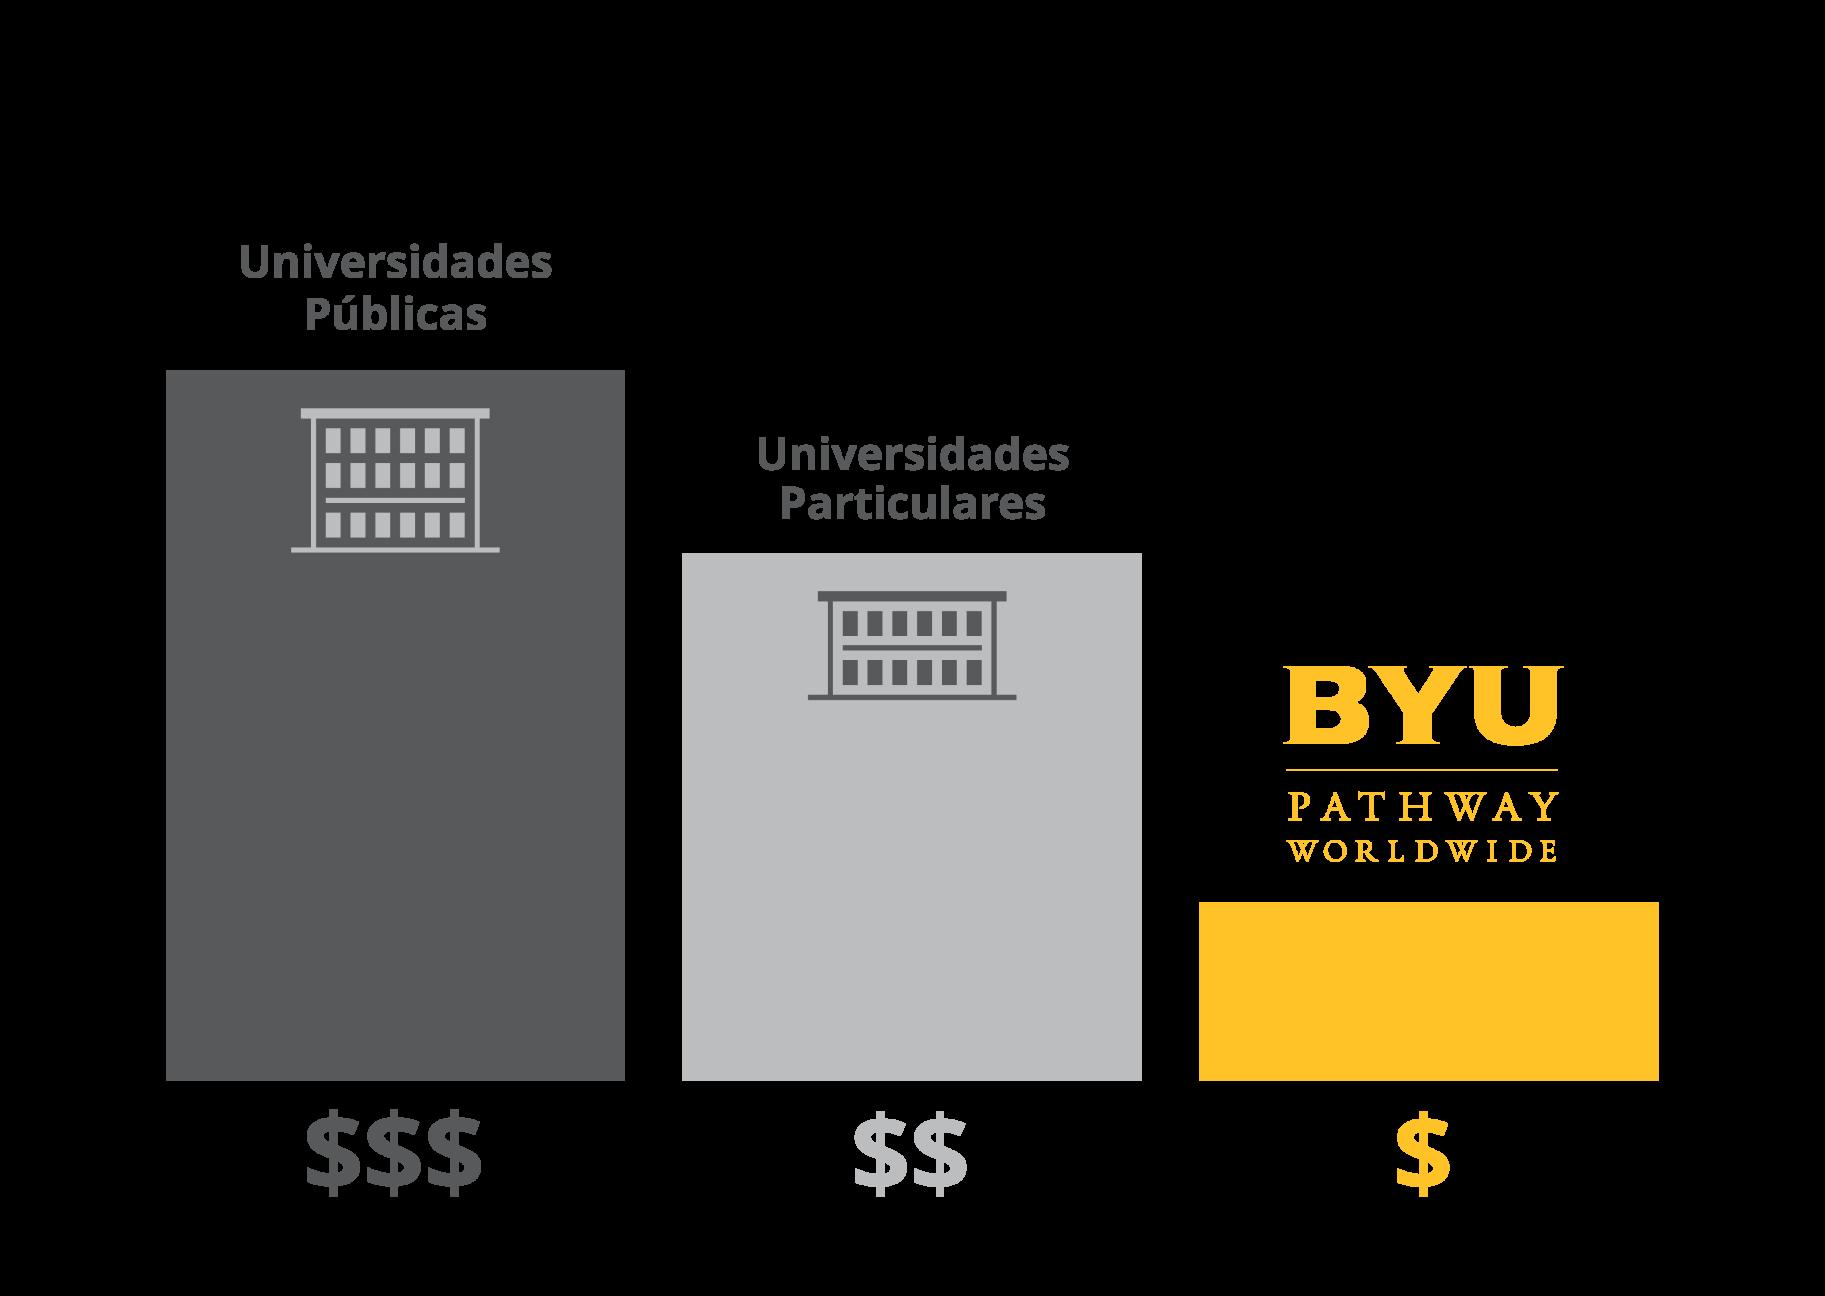 Tuition Cost Comparison - Spanish (Transparent)